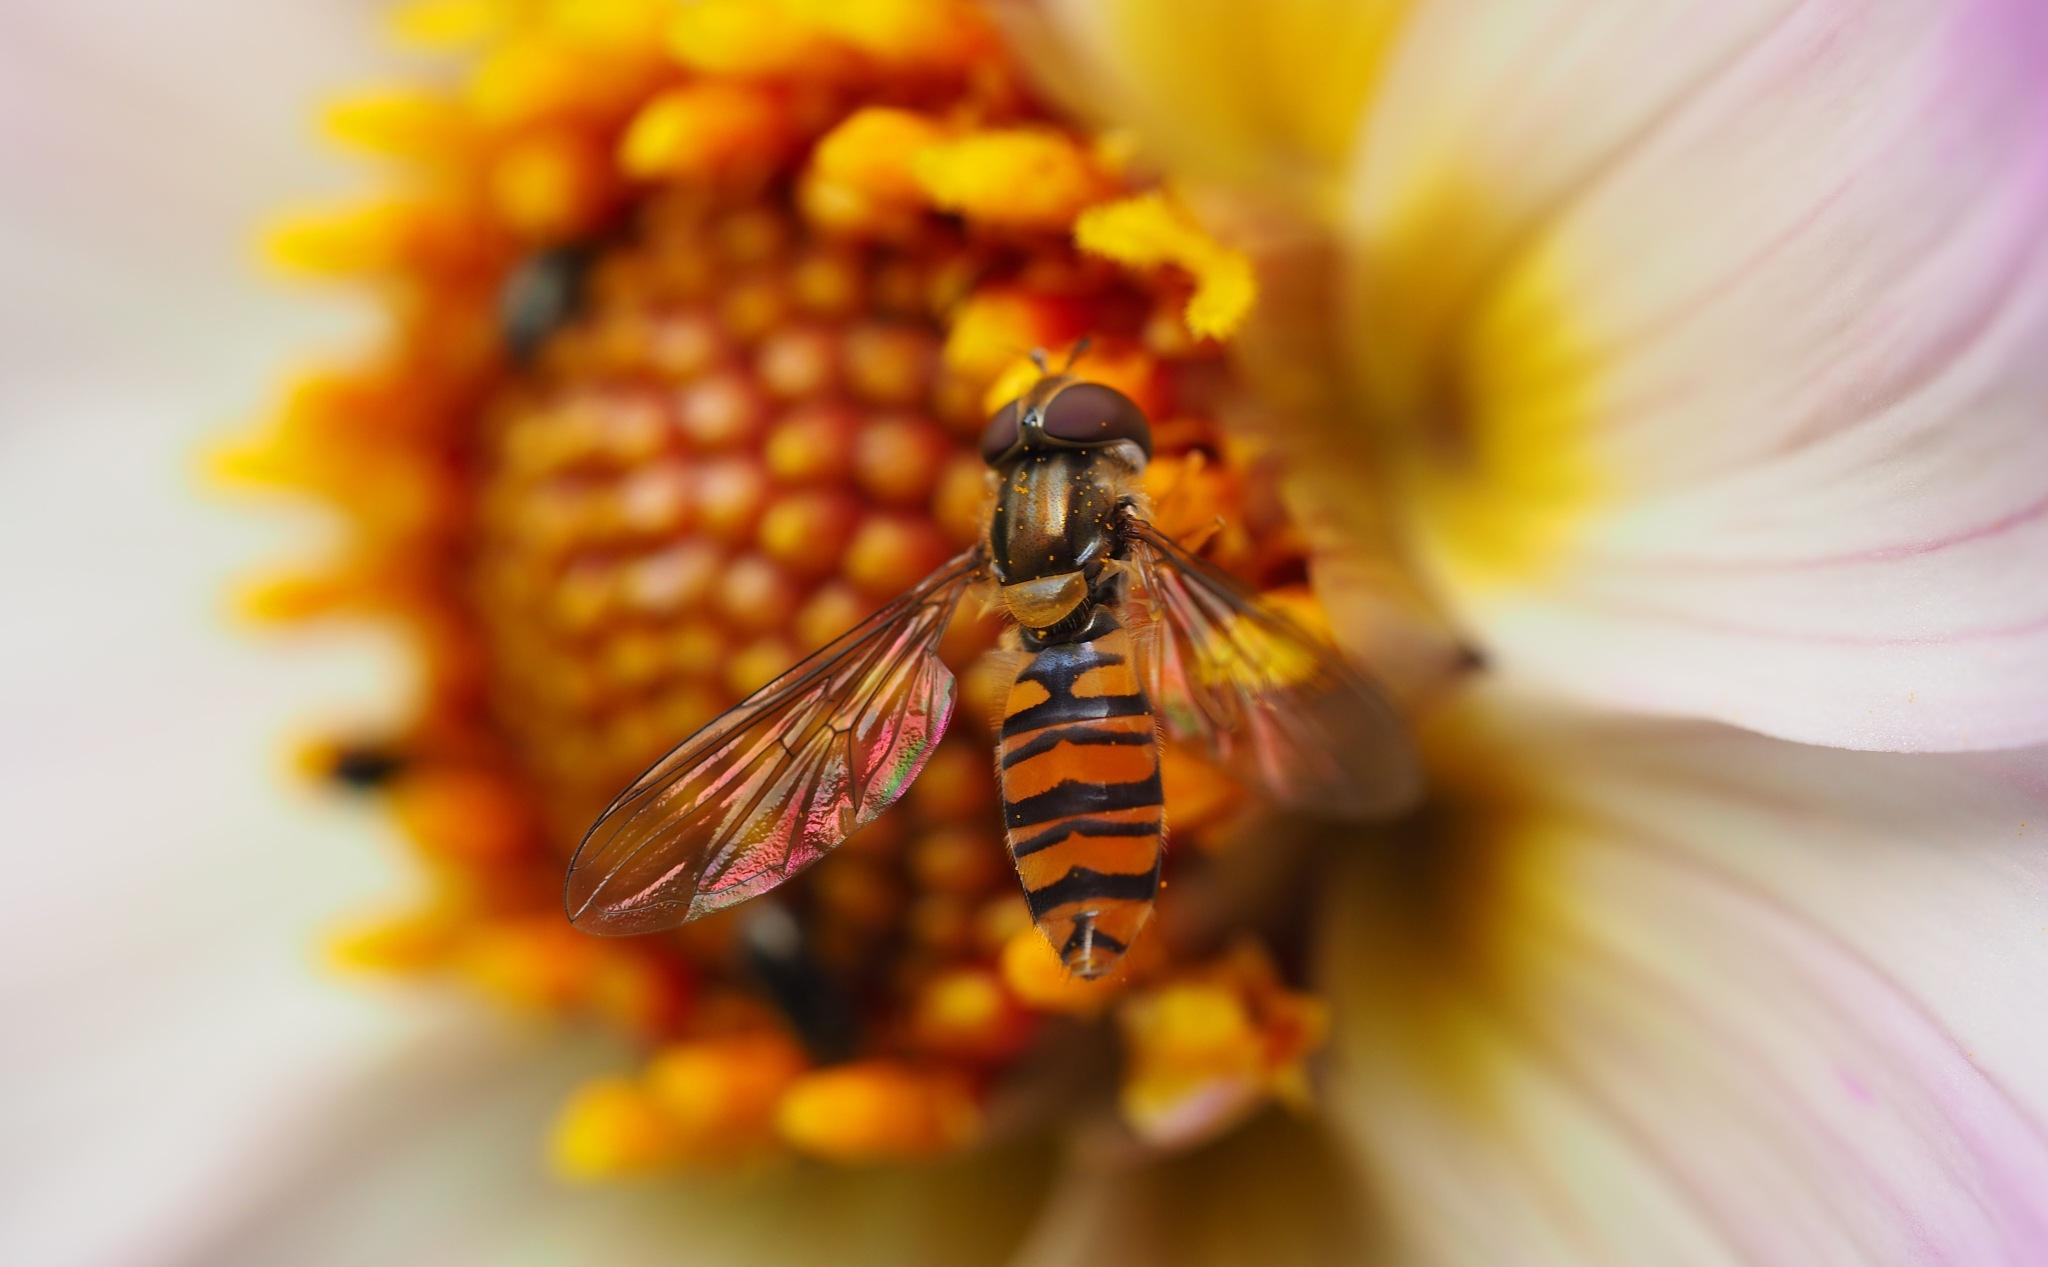 Hoverfly on Dahlia Centre by Gillian James